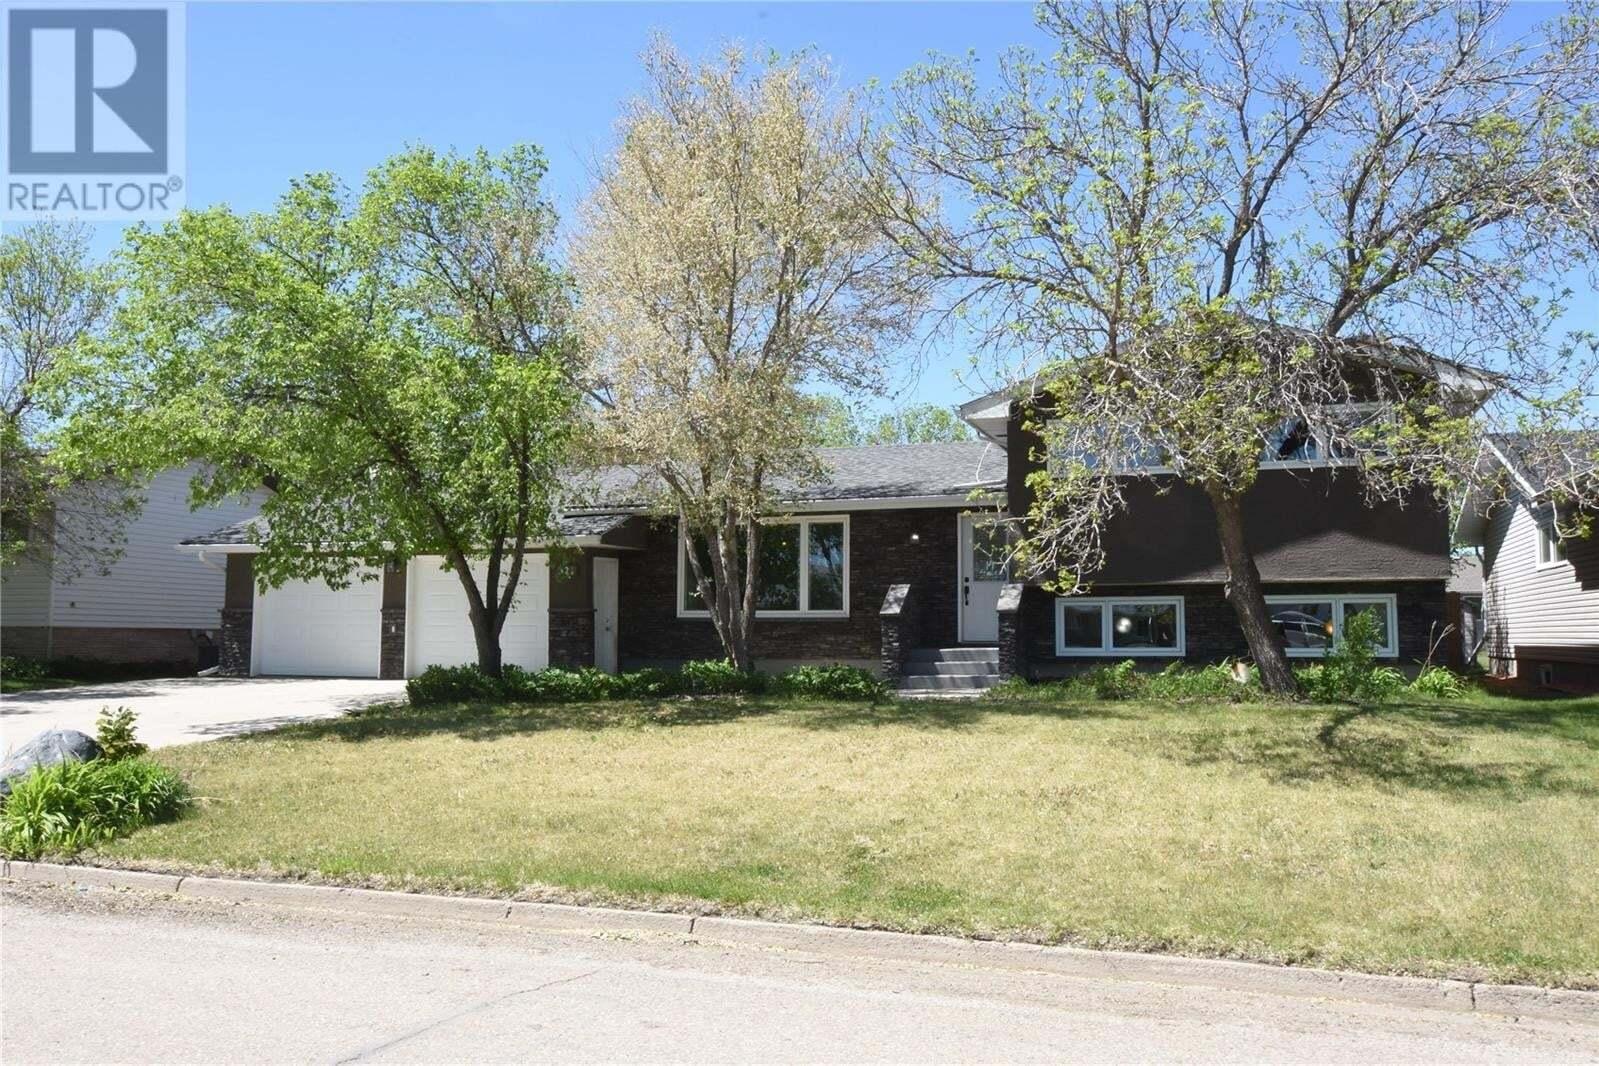 House for sale at 321 Carrington St Milestone Saskatchewan - MLS: SK810658